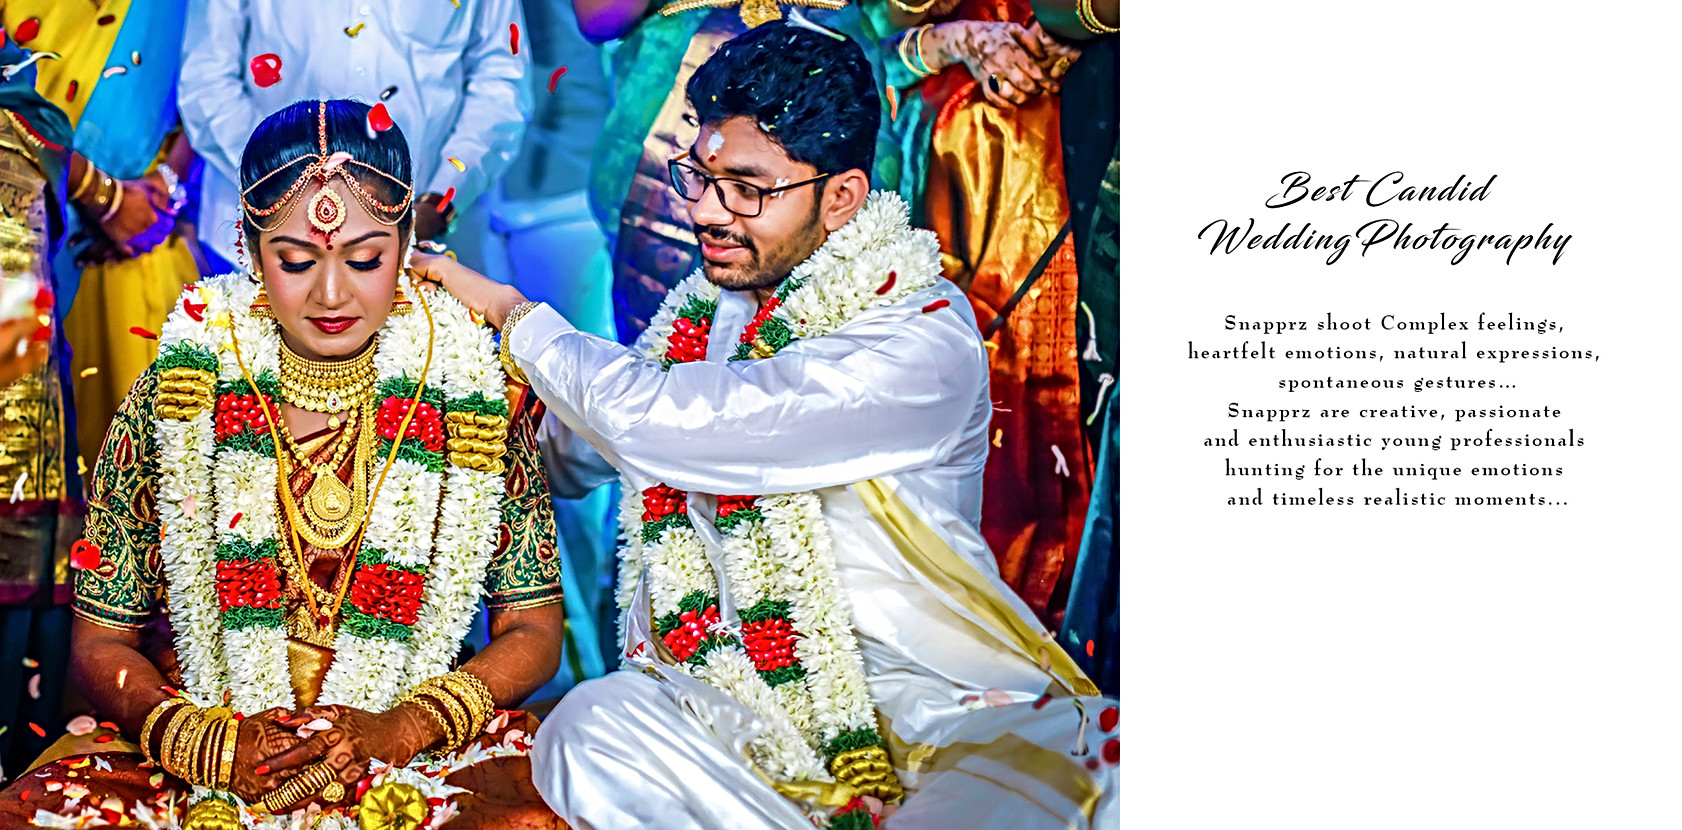 Best Candid Wedding Photography.jpg